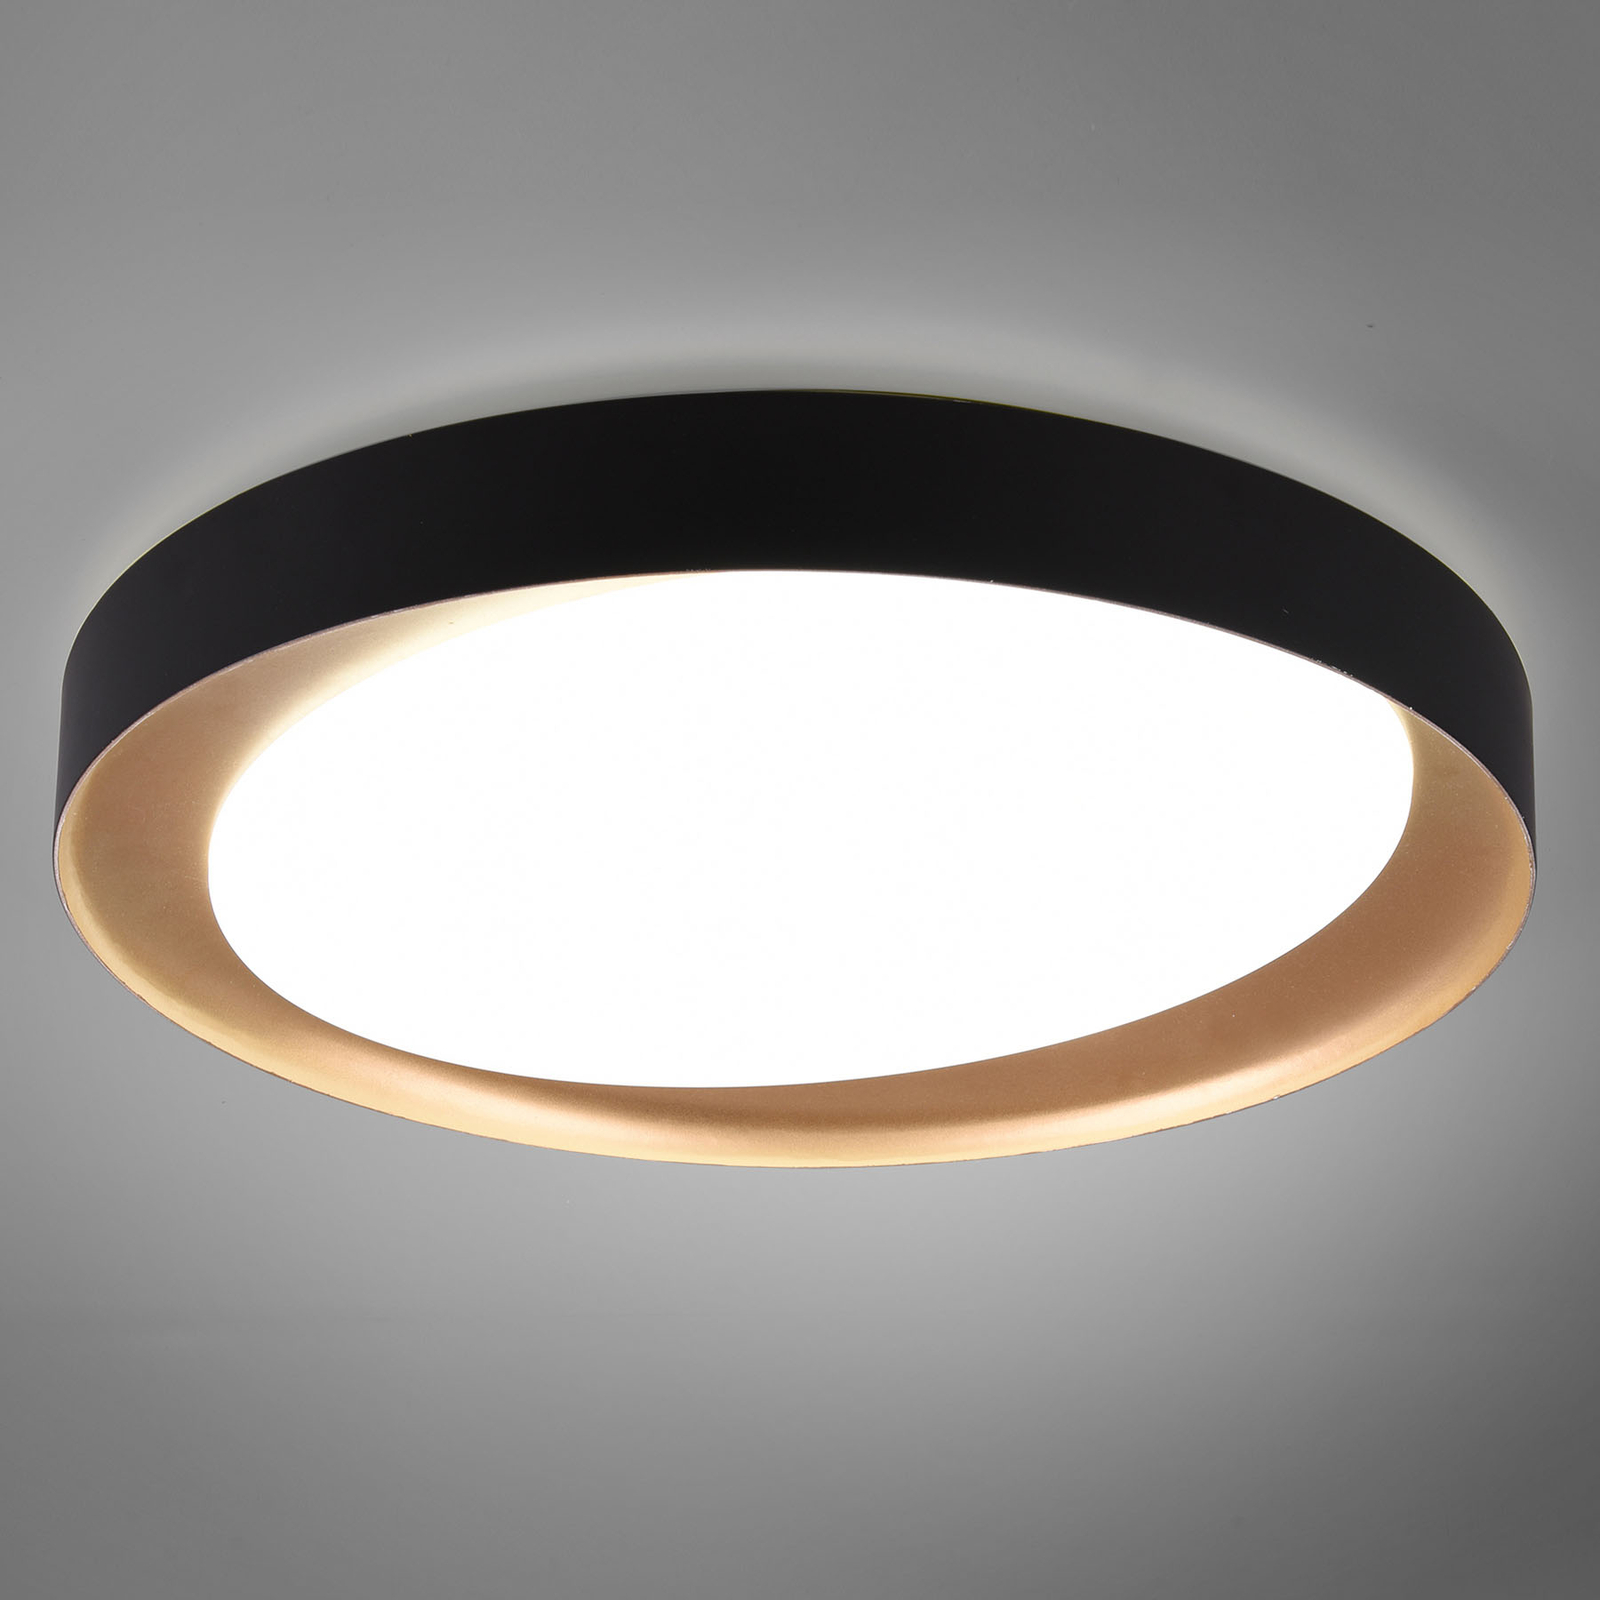 LED-Deckenleuchte Zeta tunable white, schwarz/gold